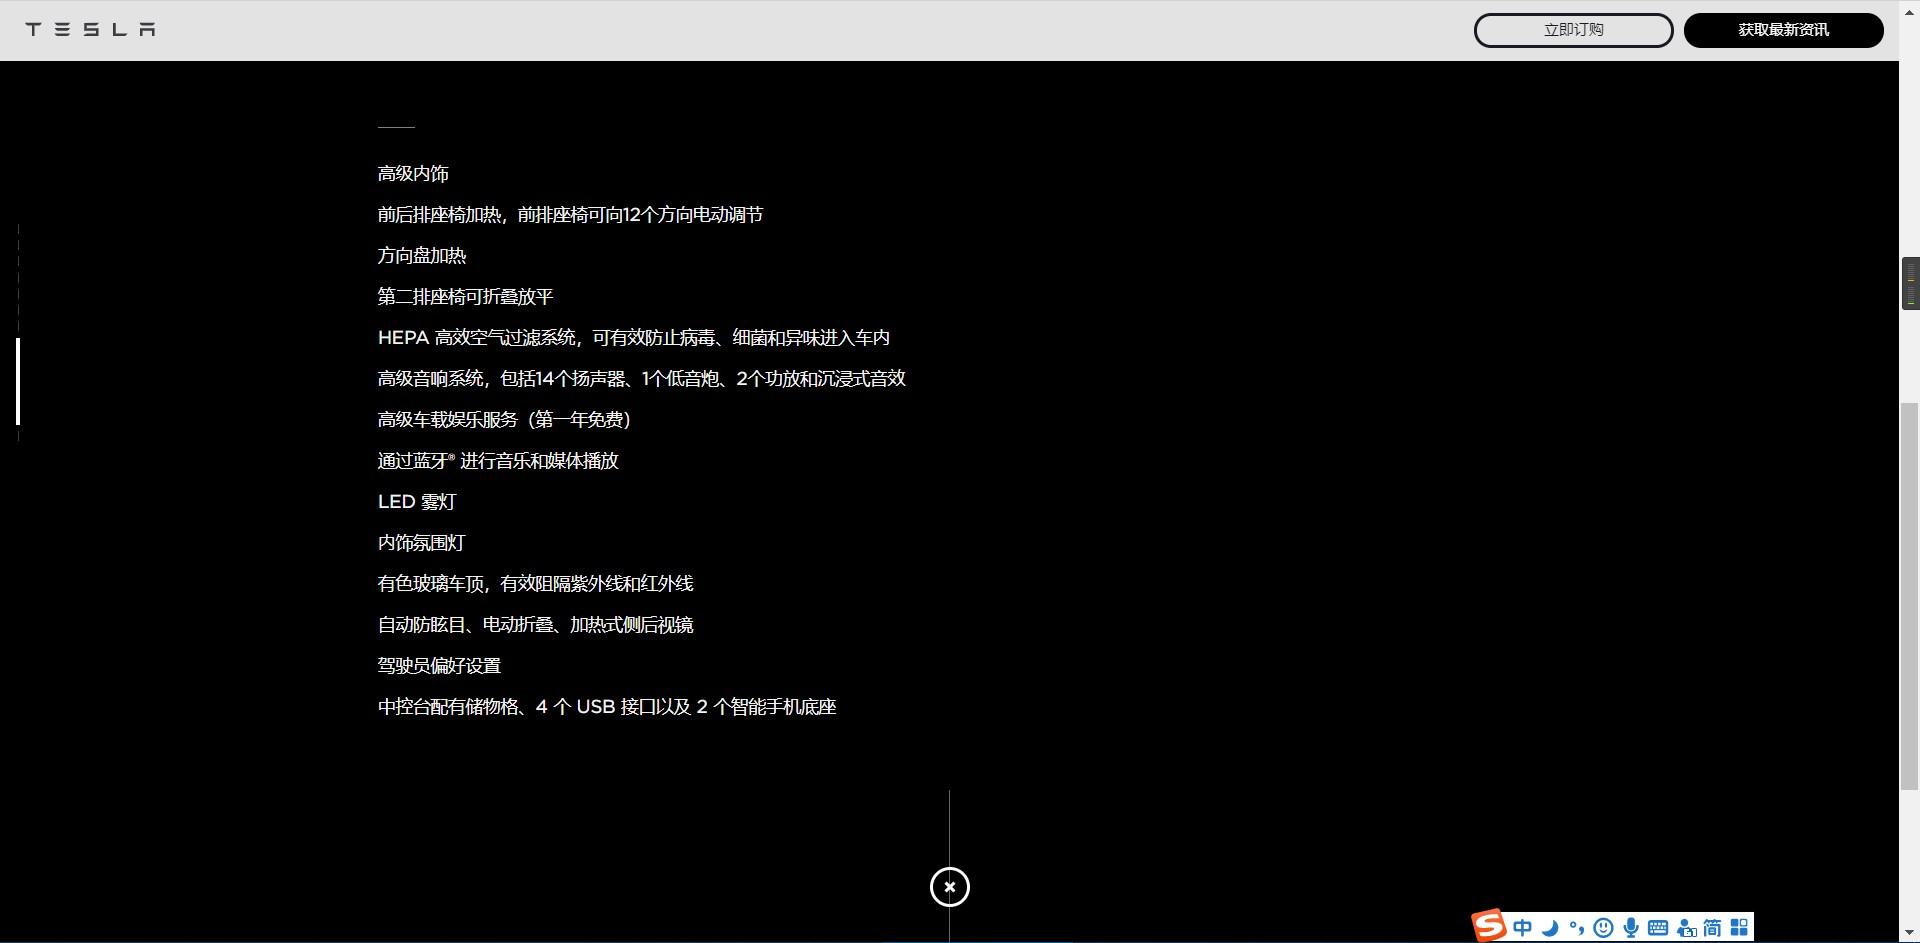 <a href=http://www.bevzc.com target=_blank class=infotextkey>电动汽车</a>之窗